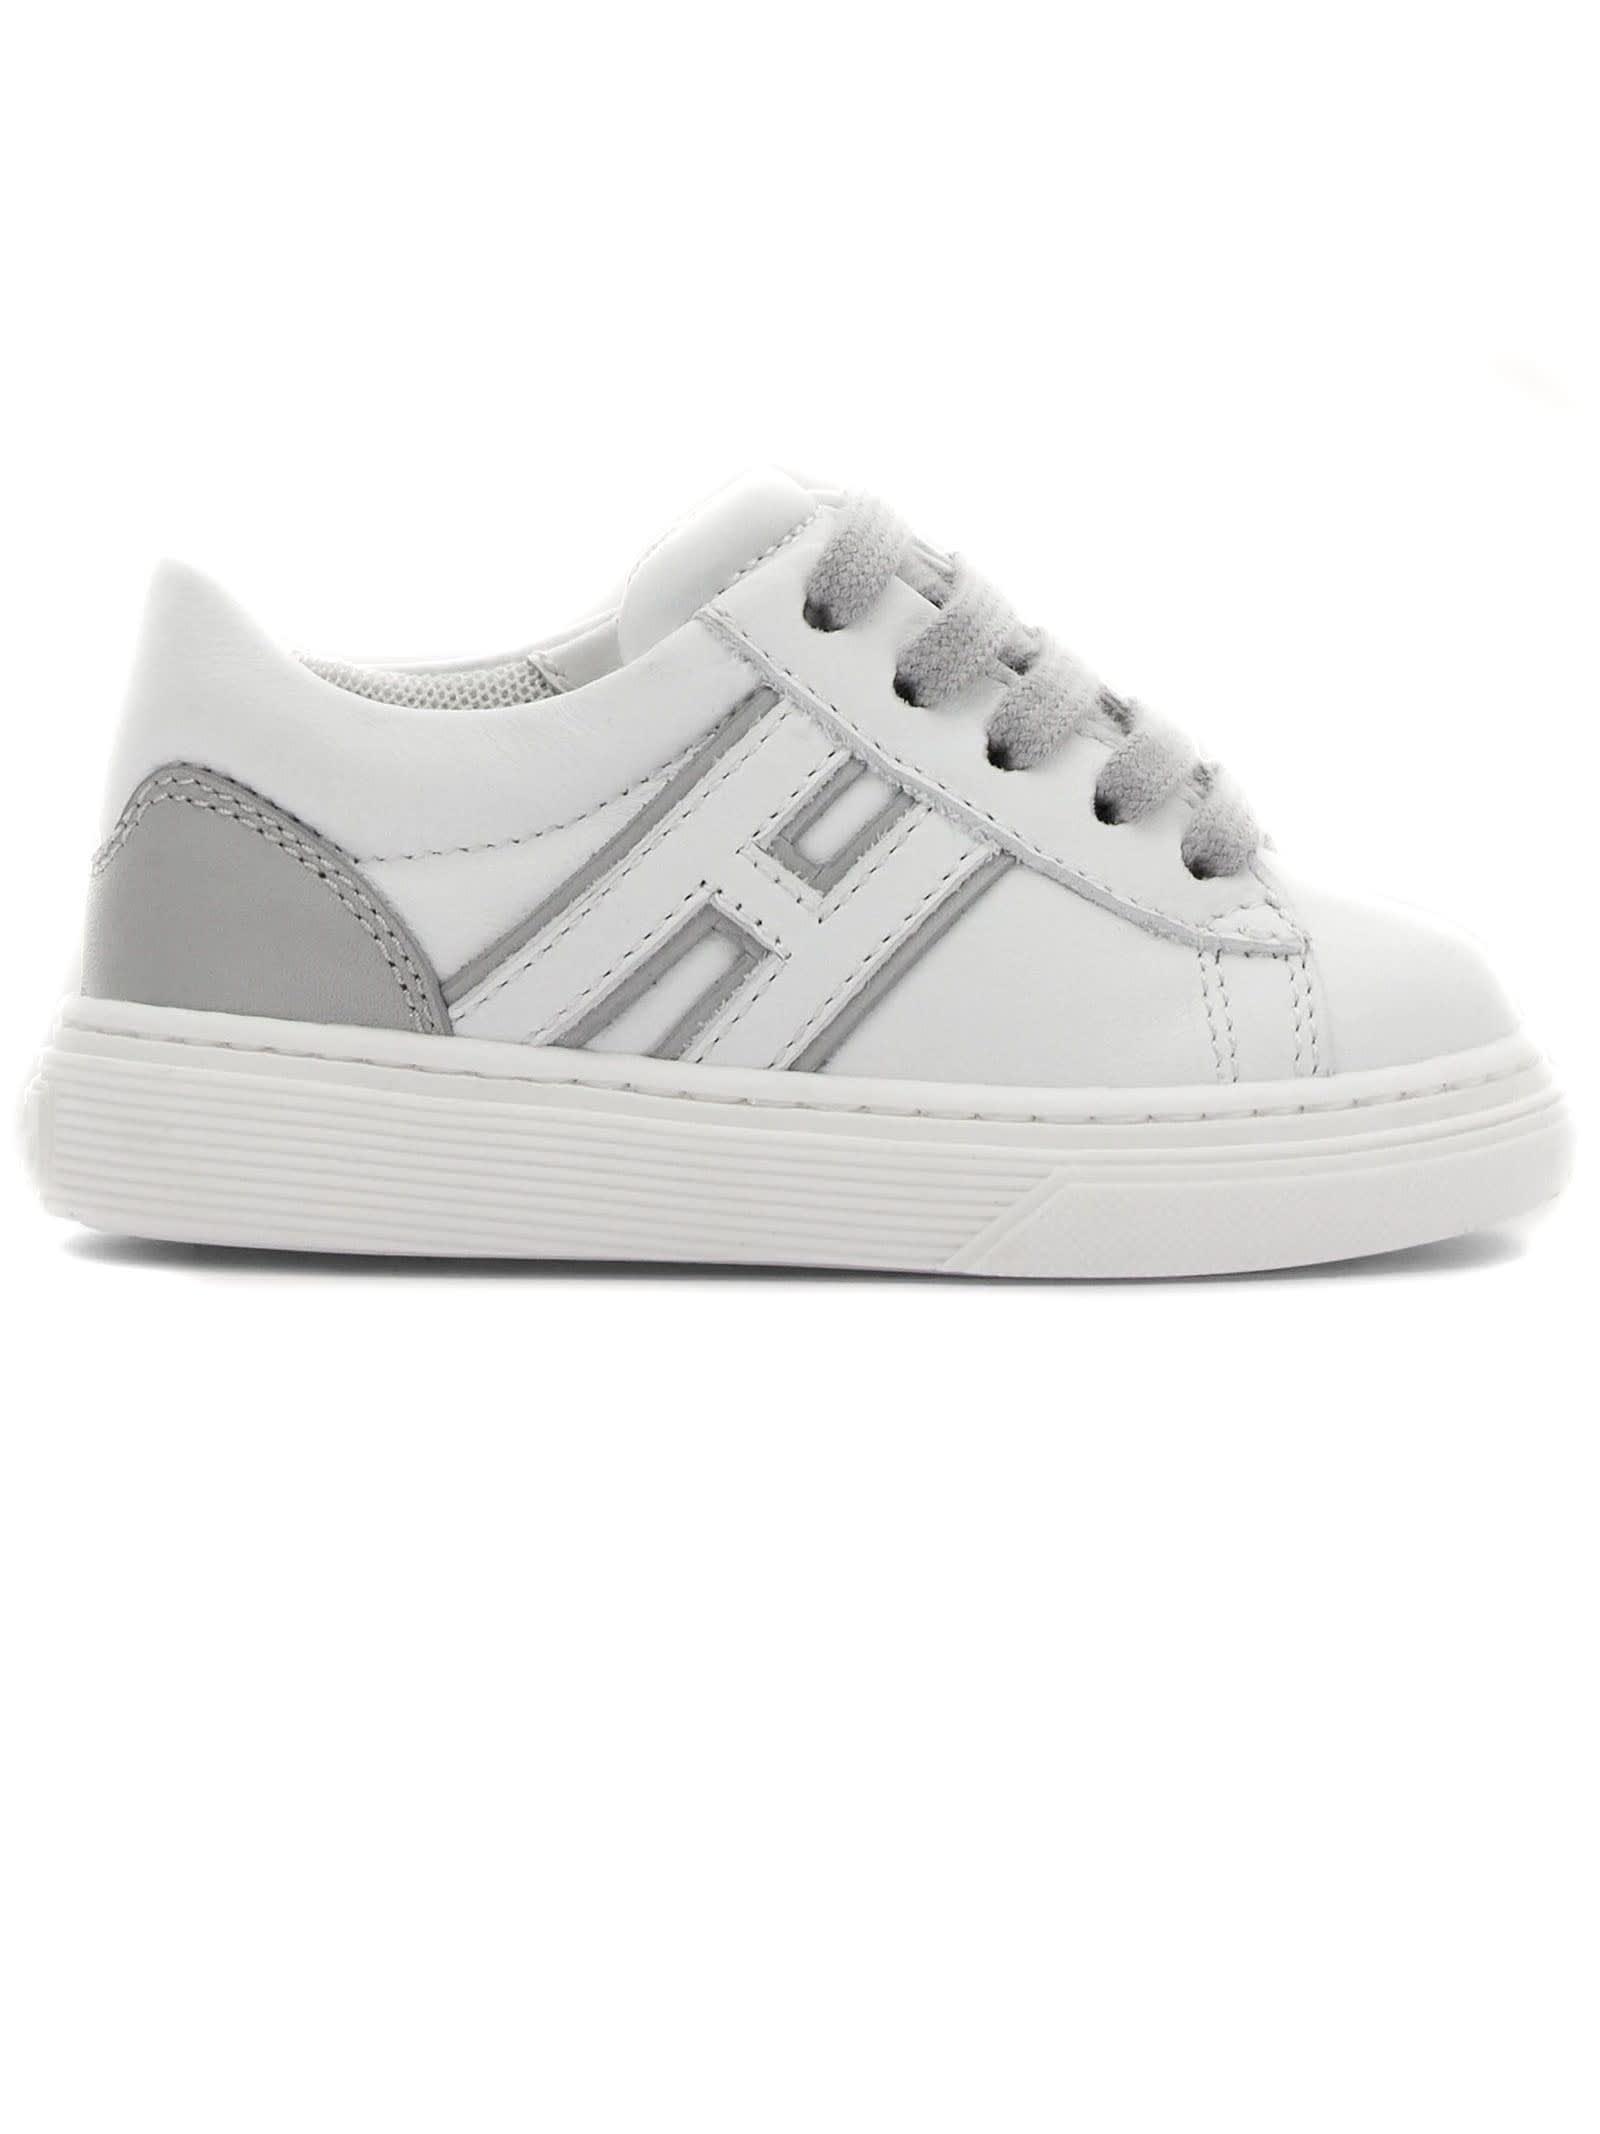 Hogan Sneakers H365 White